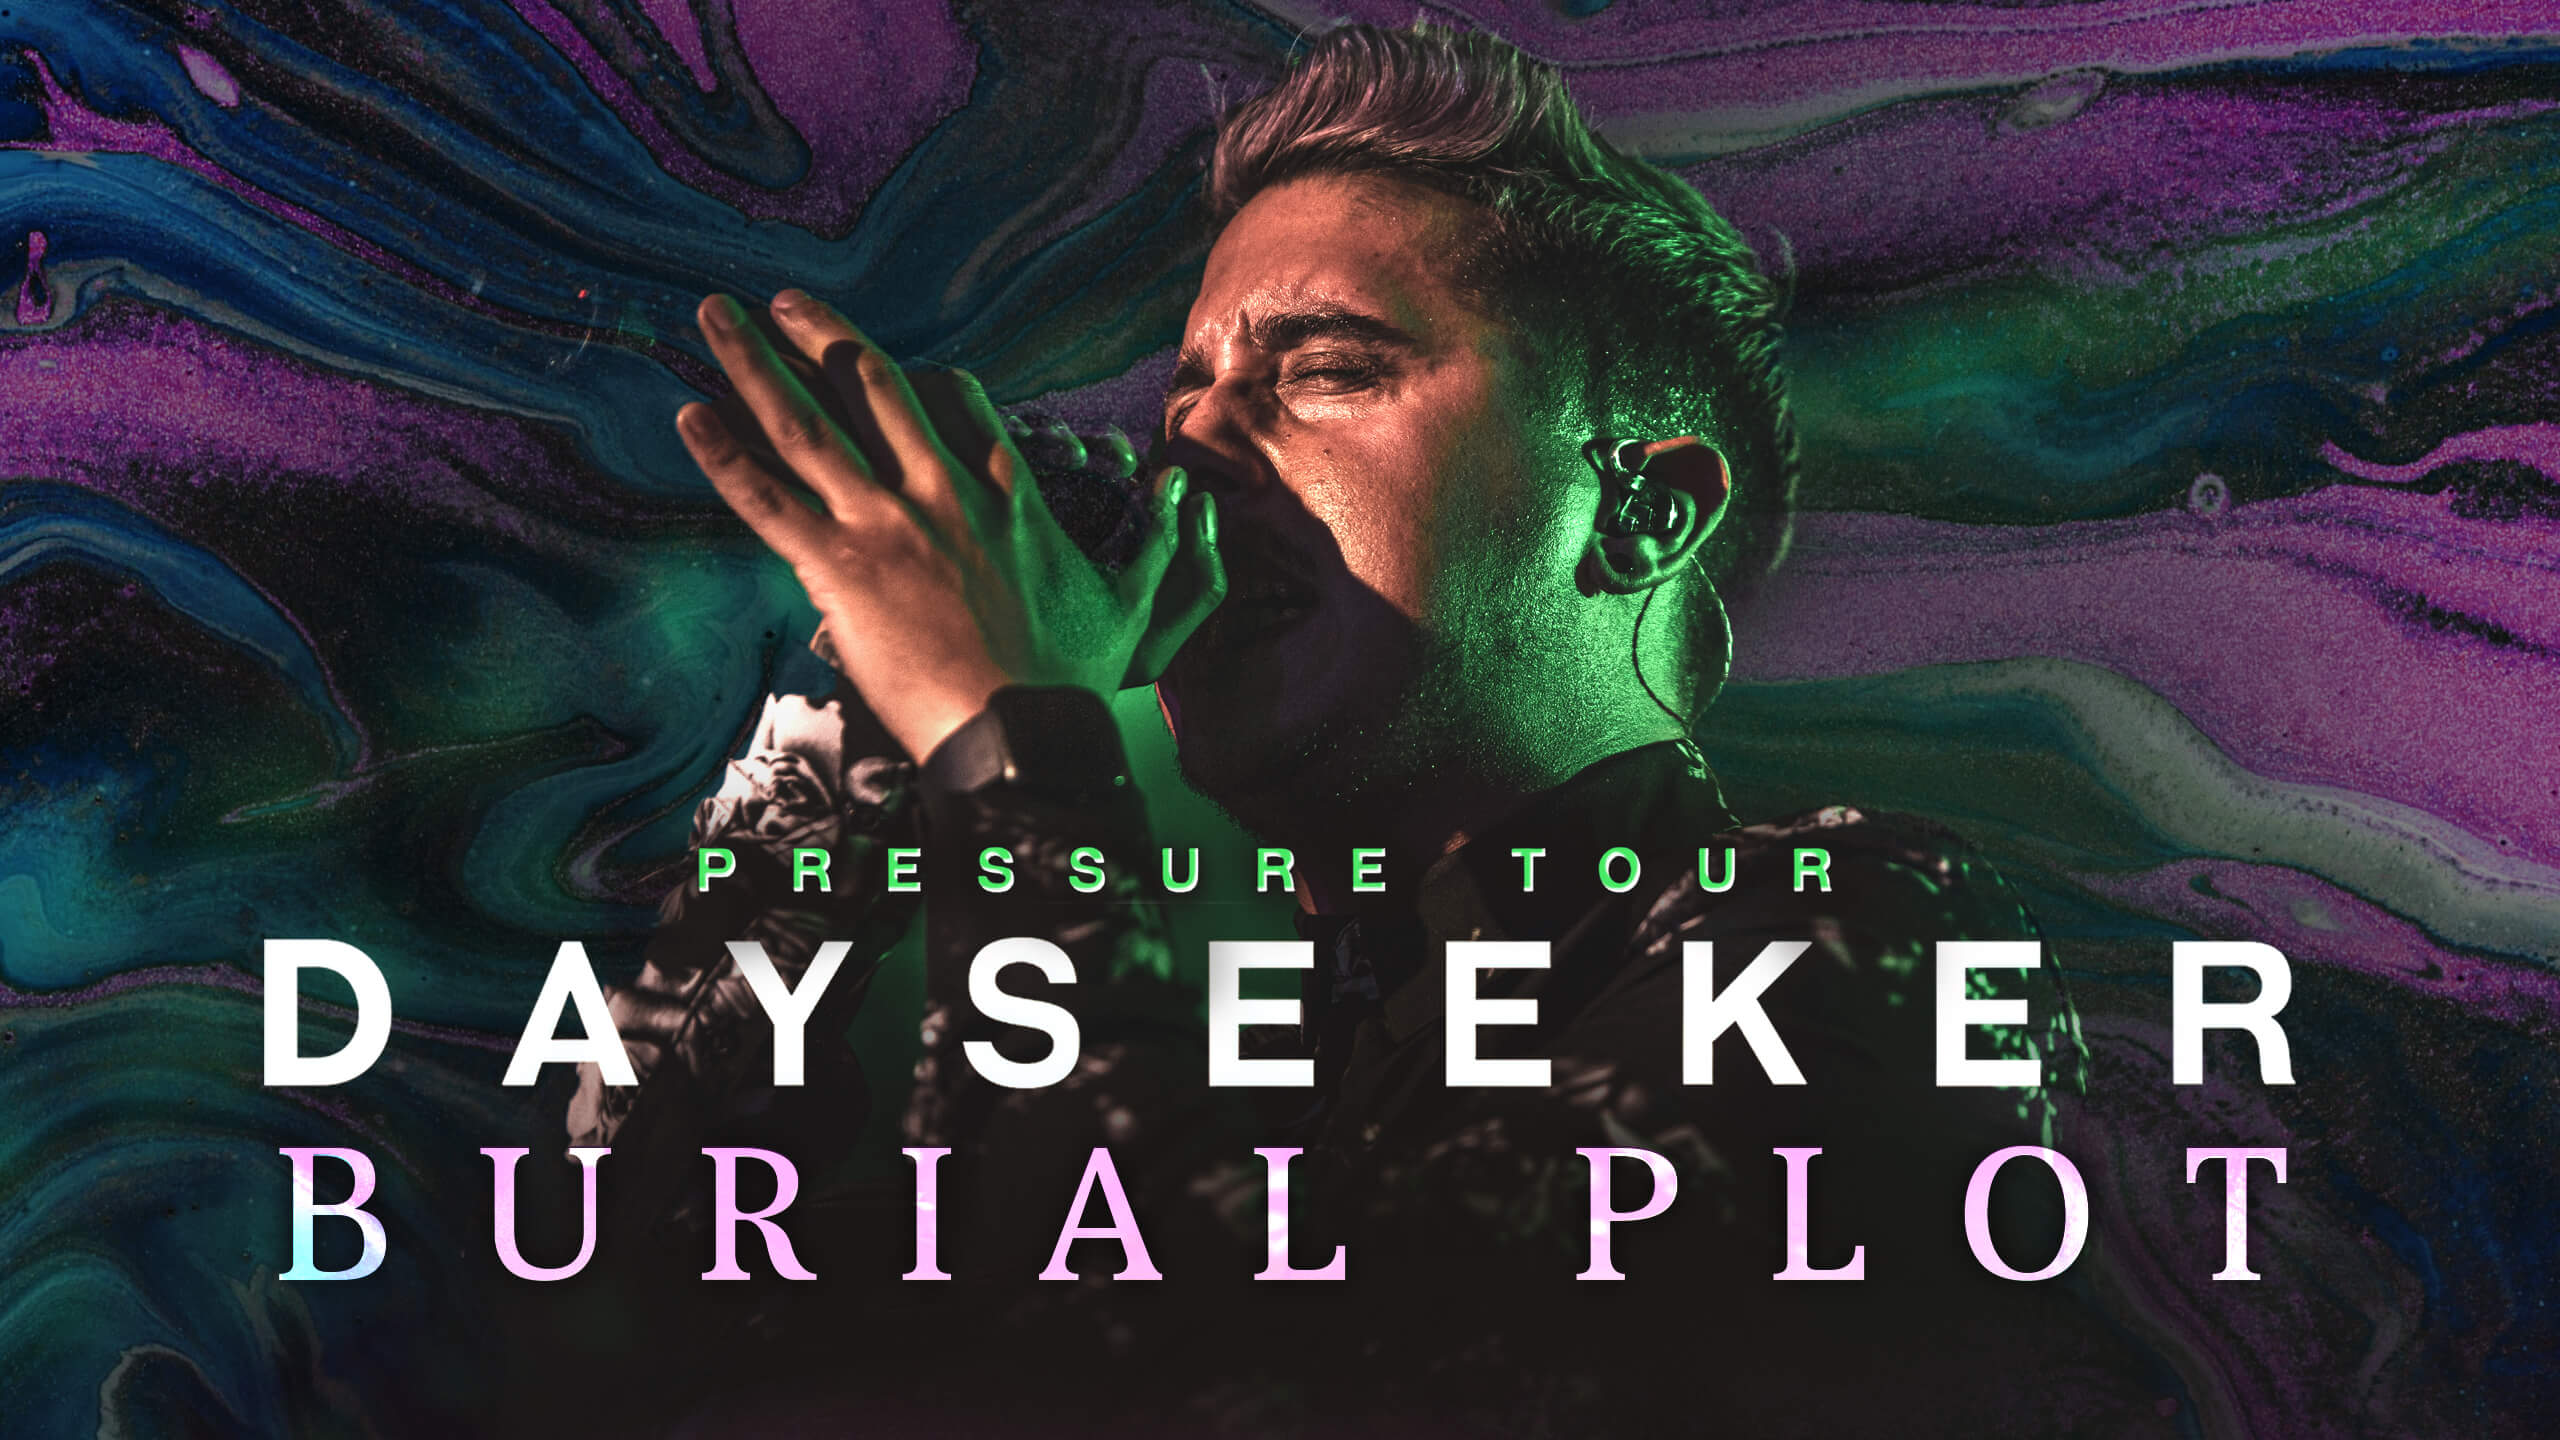 "LIVE: WATCH DAYSEEKER PERFORM ""BURIAL PLOT"" (PRESSURE TOUR)"